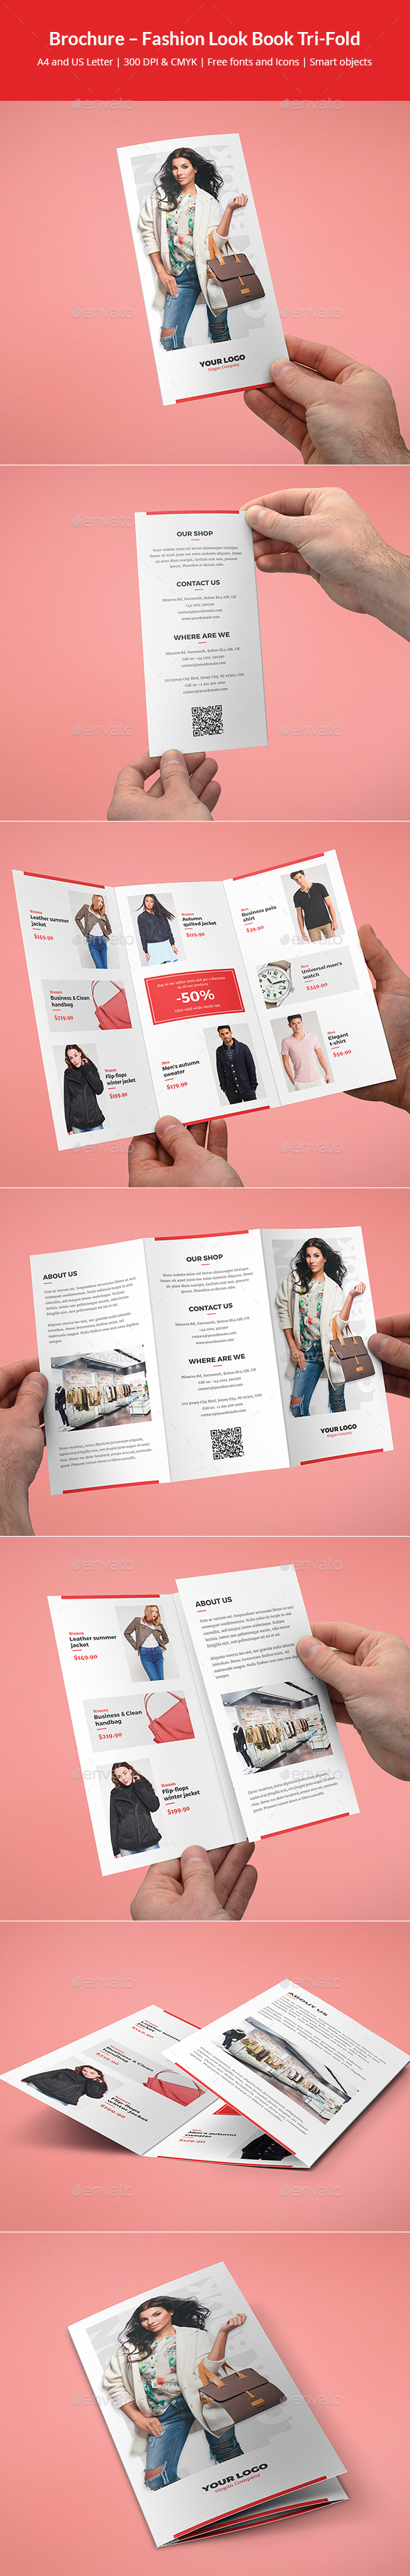 Brochure – Fashion Look Book Tri-Fold - Informational Brochures